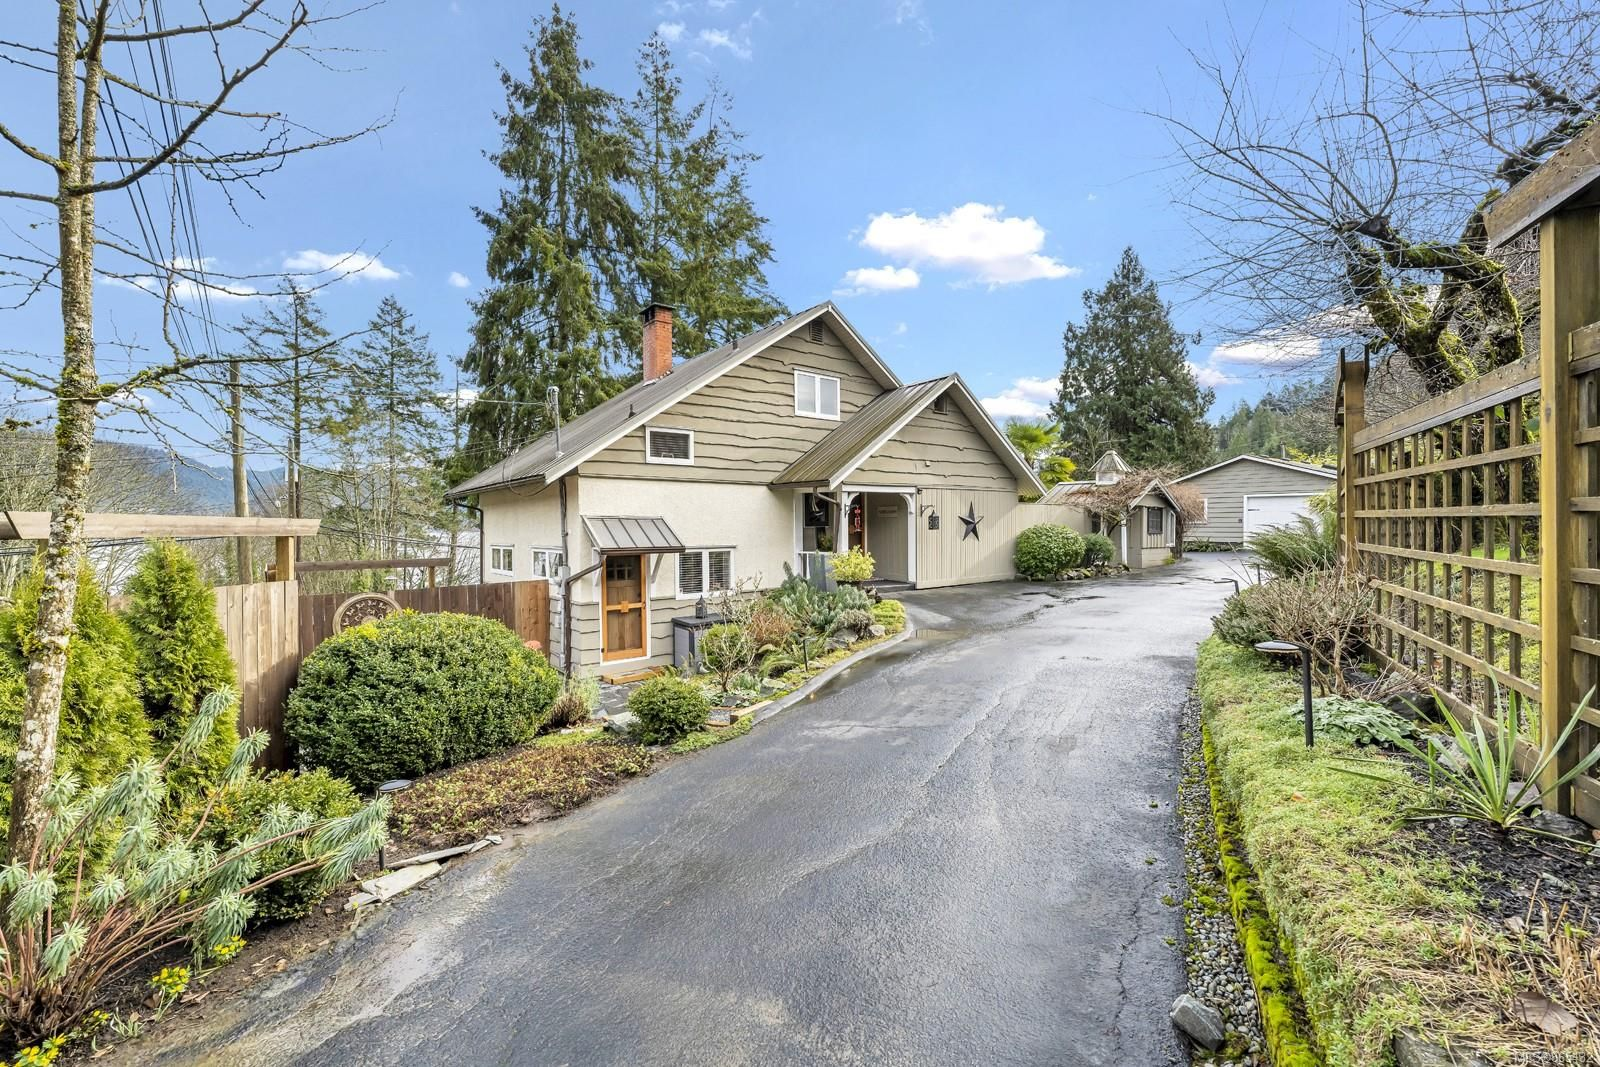 Photo 3: Photos: 6734 Drummond Dr in : Du East Duncan House for sale (Duncan)  : MLS®# 865432